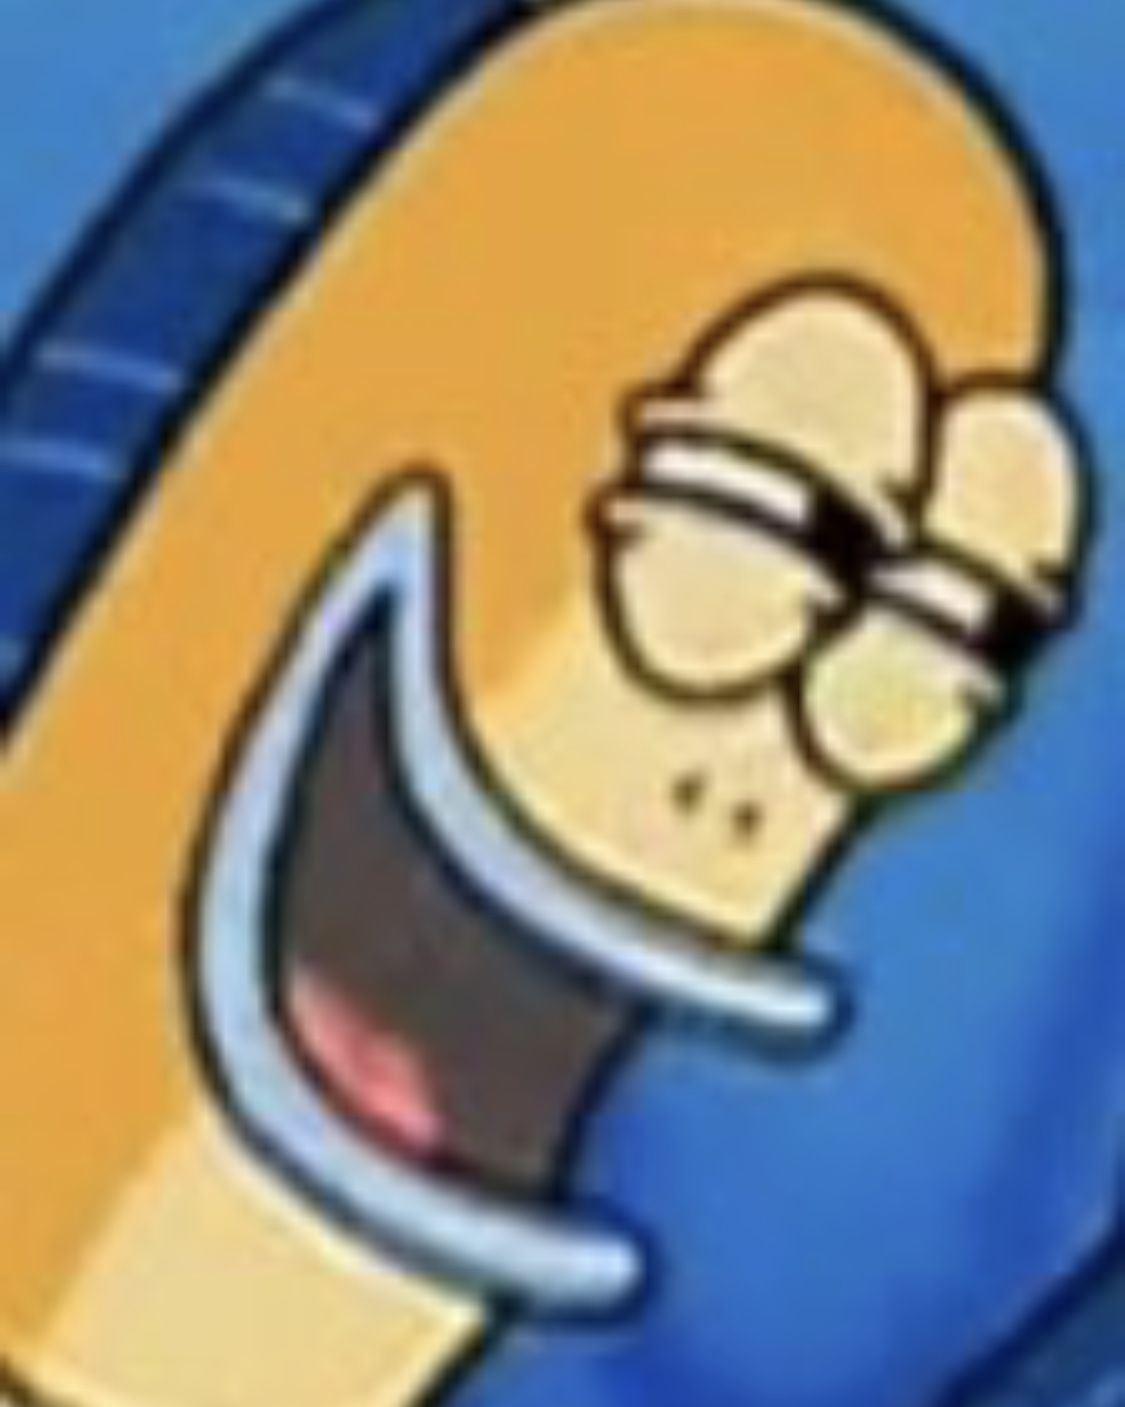 2530 Best Dank Meme Preservation Chamber Images In 2020 Funny Memes Funny Meme Pictures Spongebob Memes